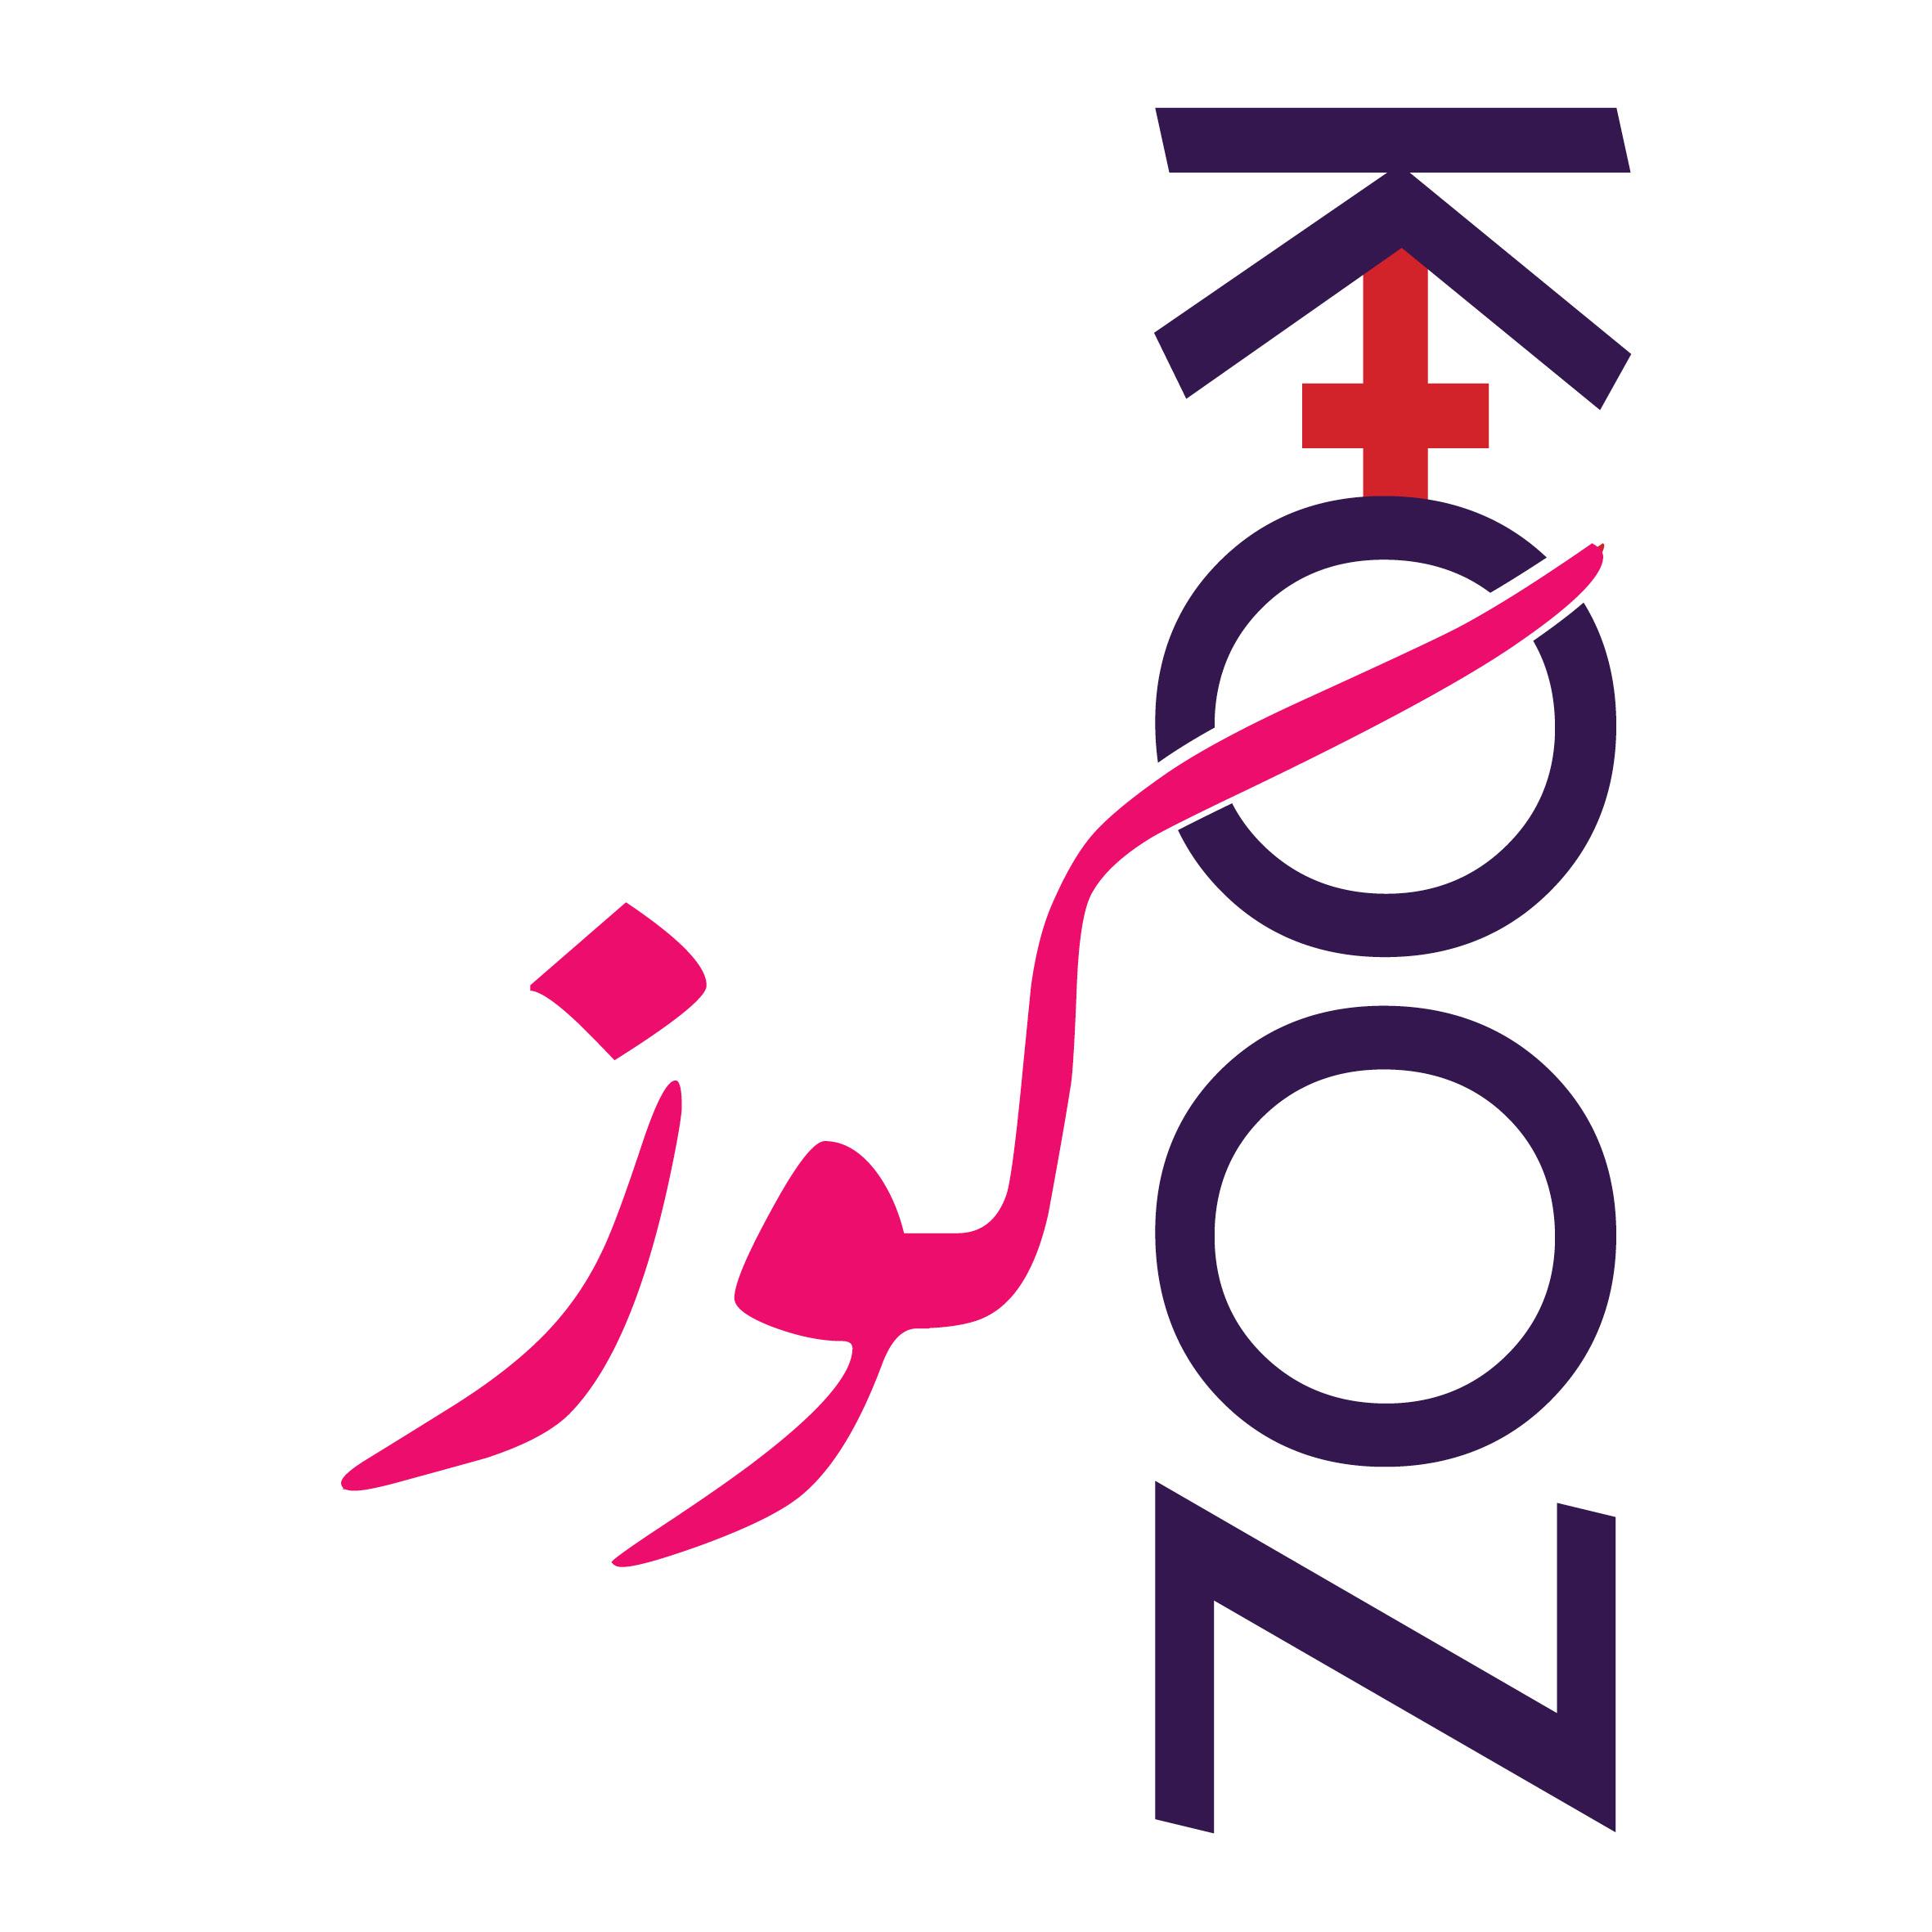 Logo kooz aswat festival queer